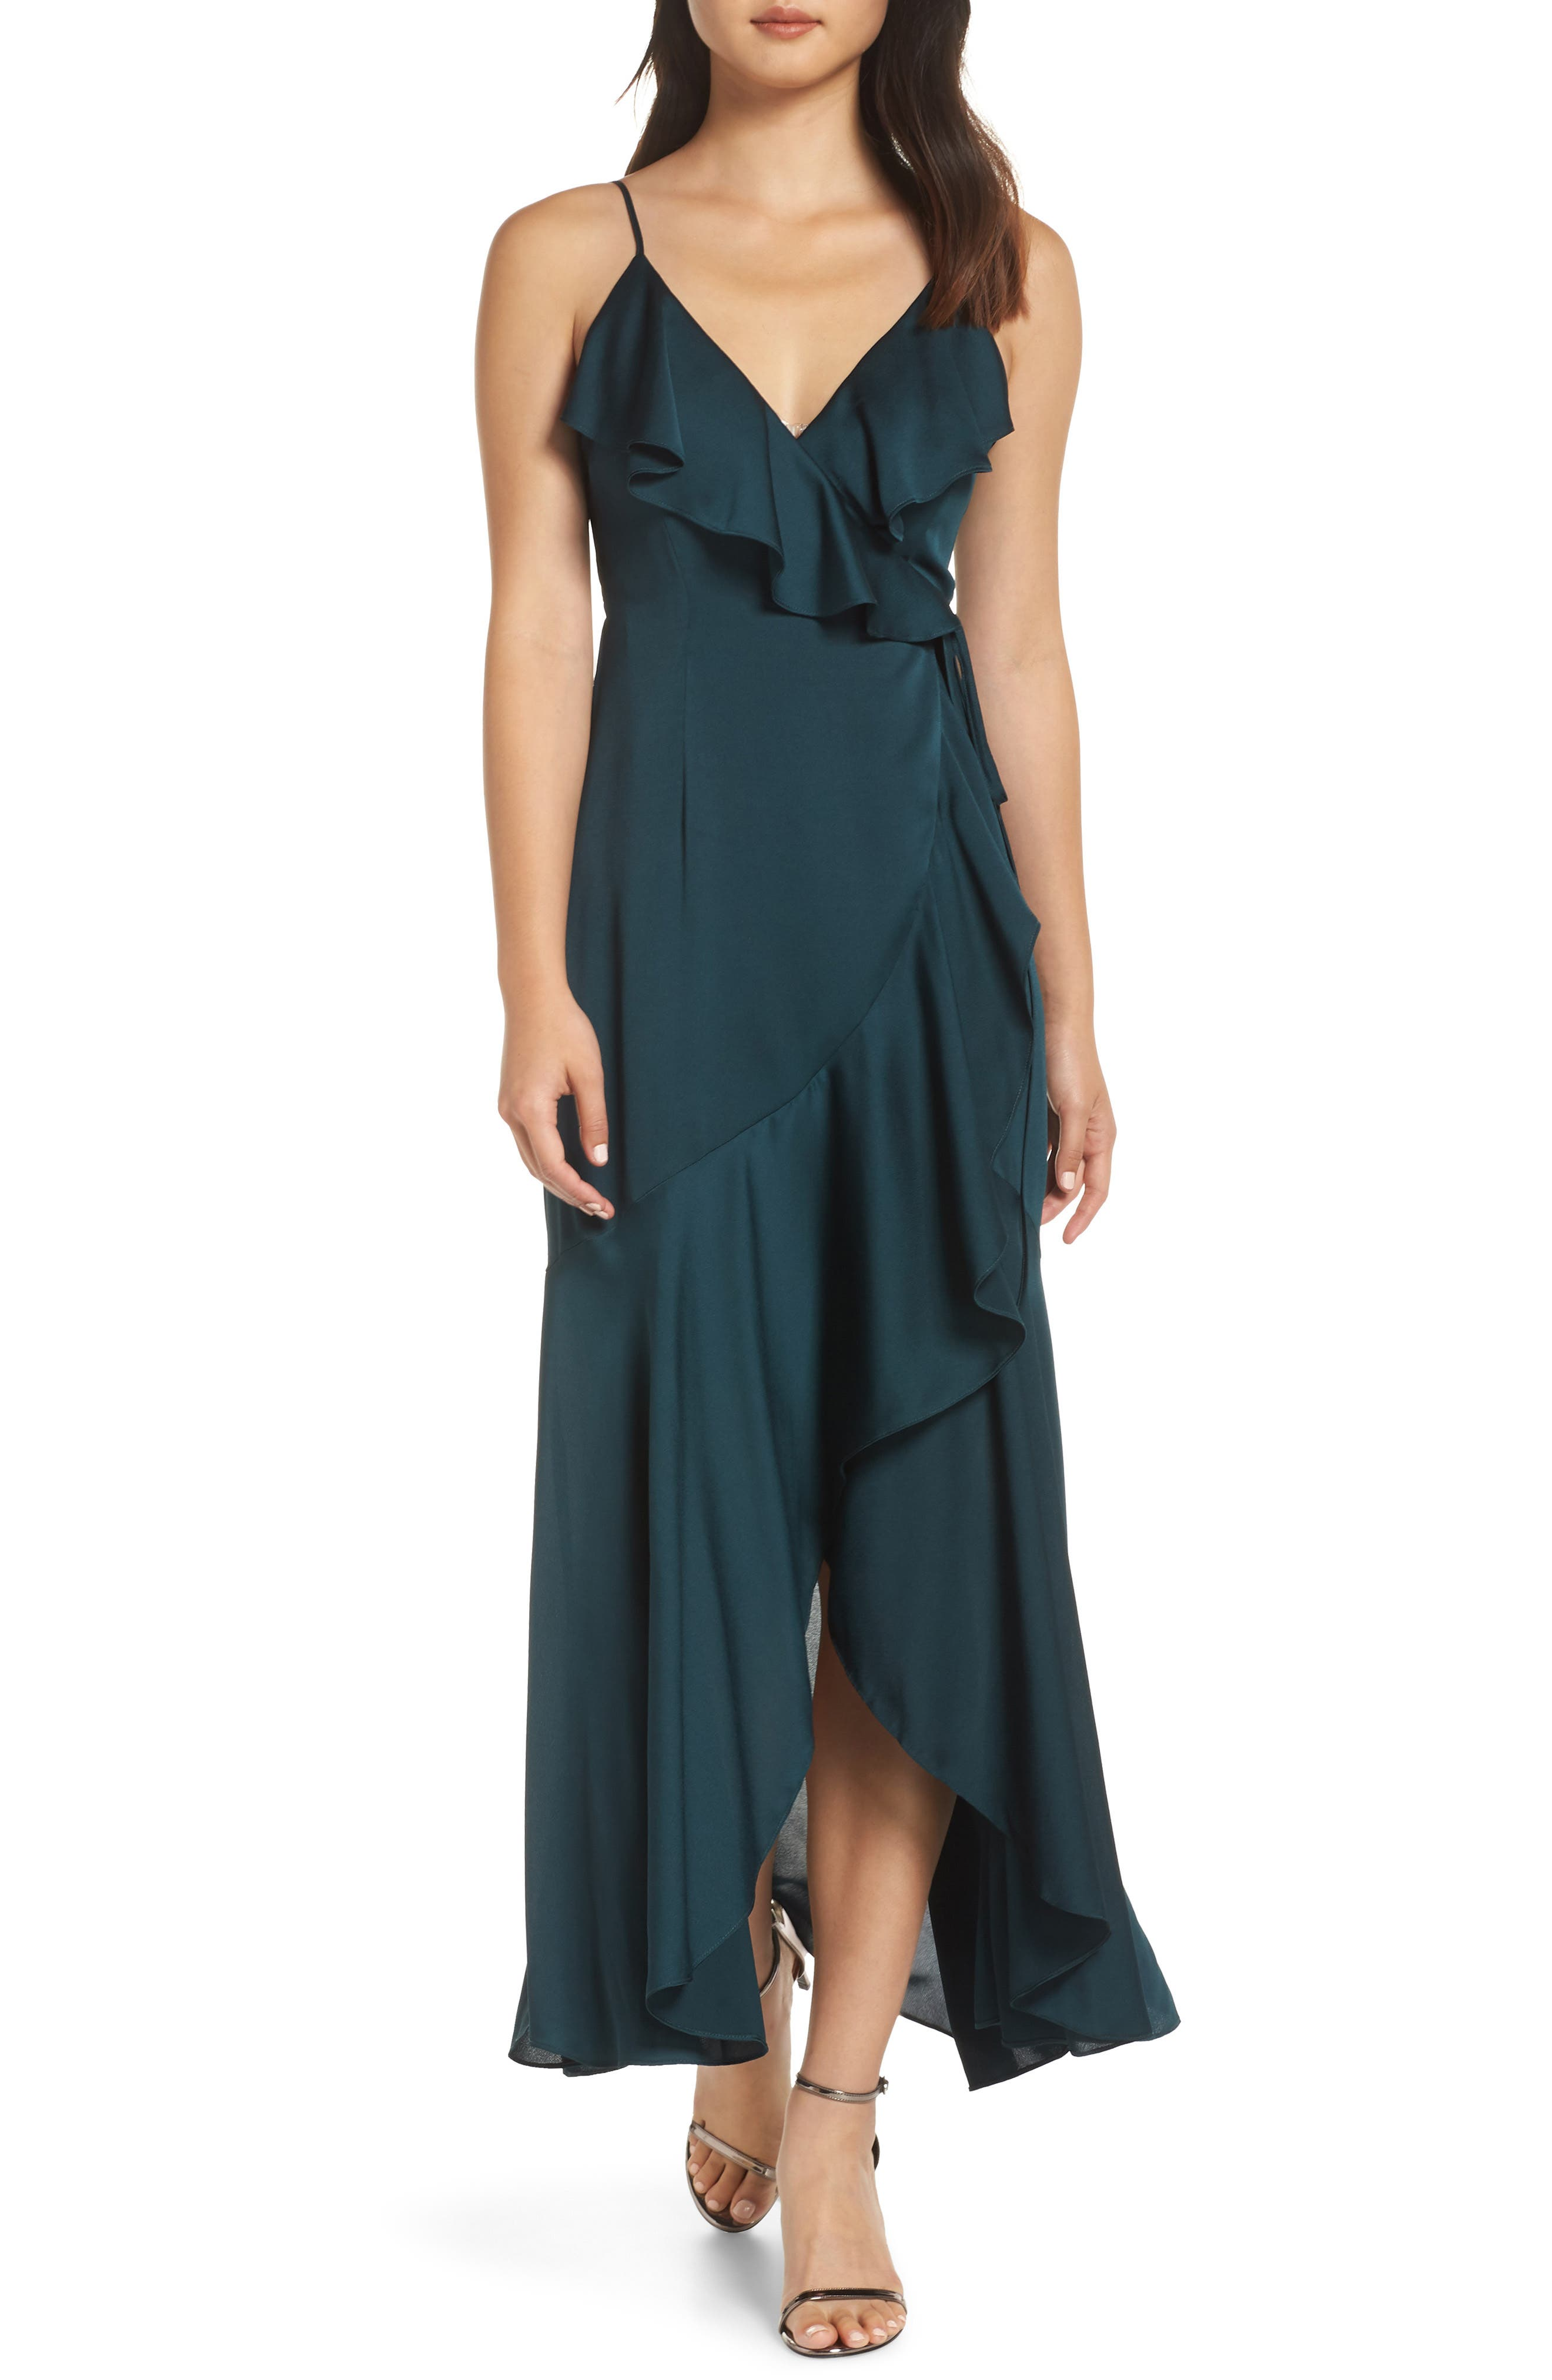 SHONA JOY Luxe Ruffle Trim Wrap Gown in Emerald